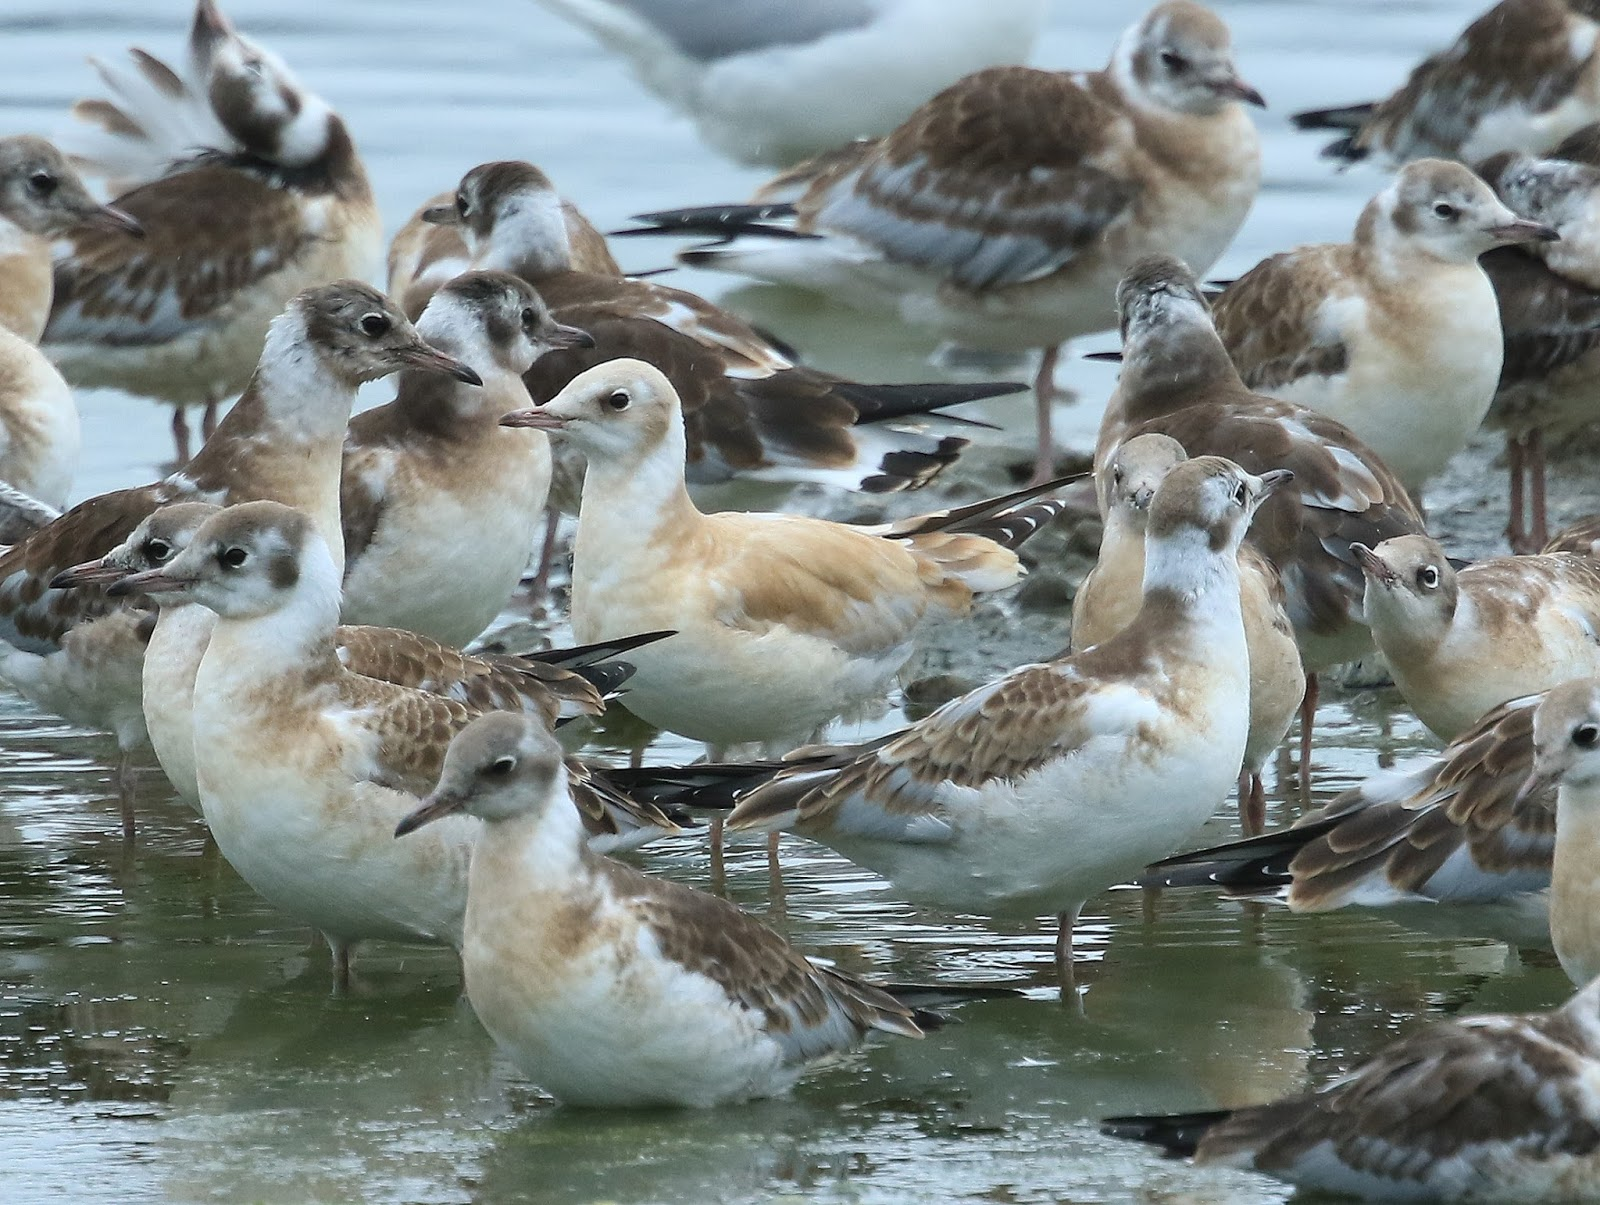 Montgomeryshire birds more bhgs cinnamon twist Bhg s